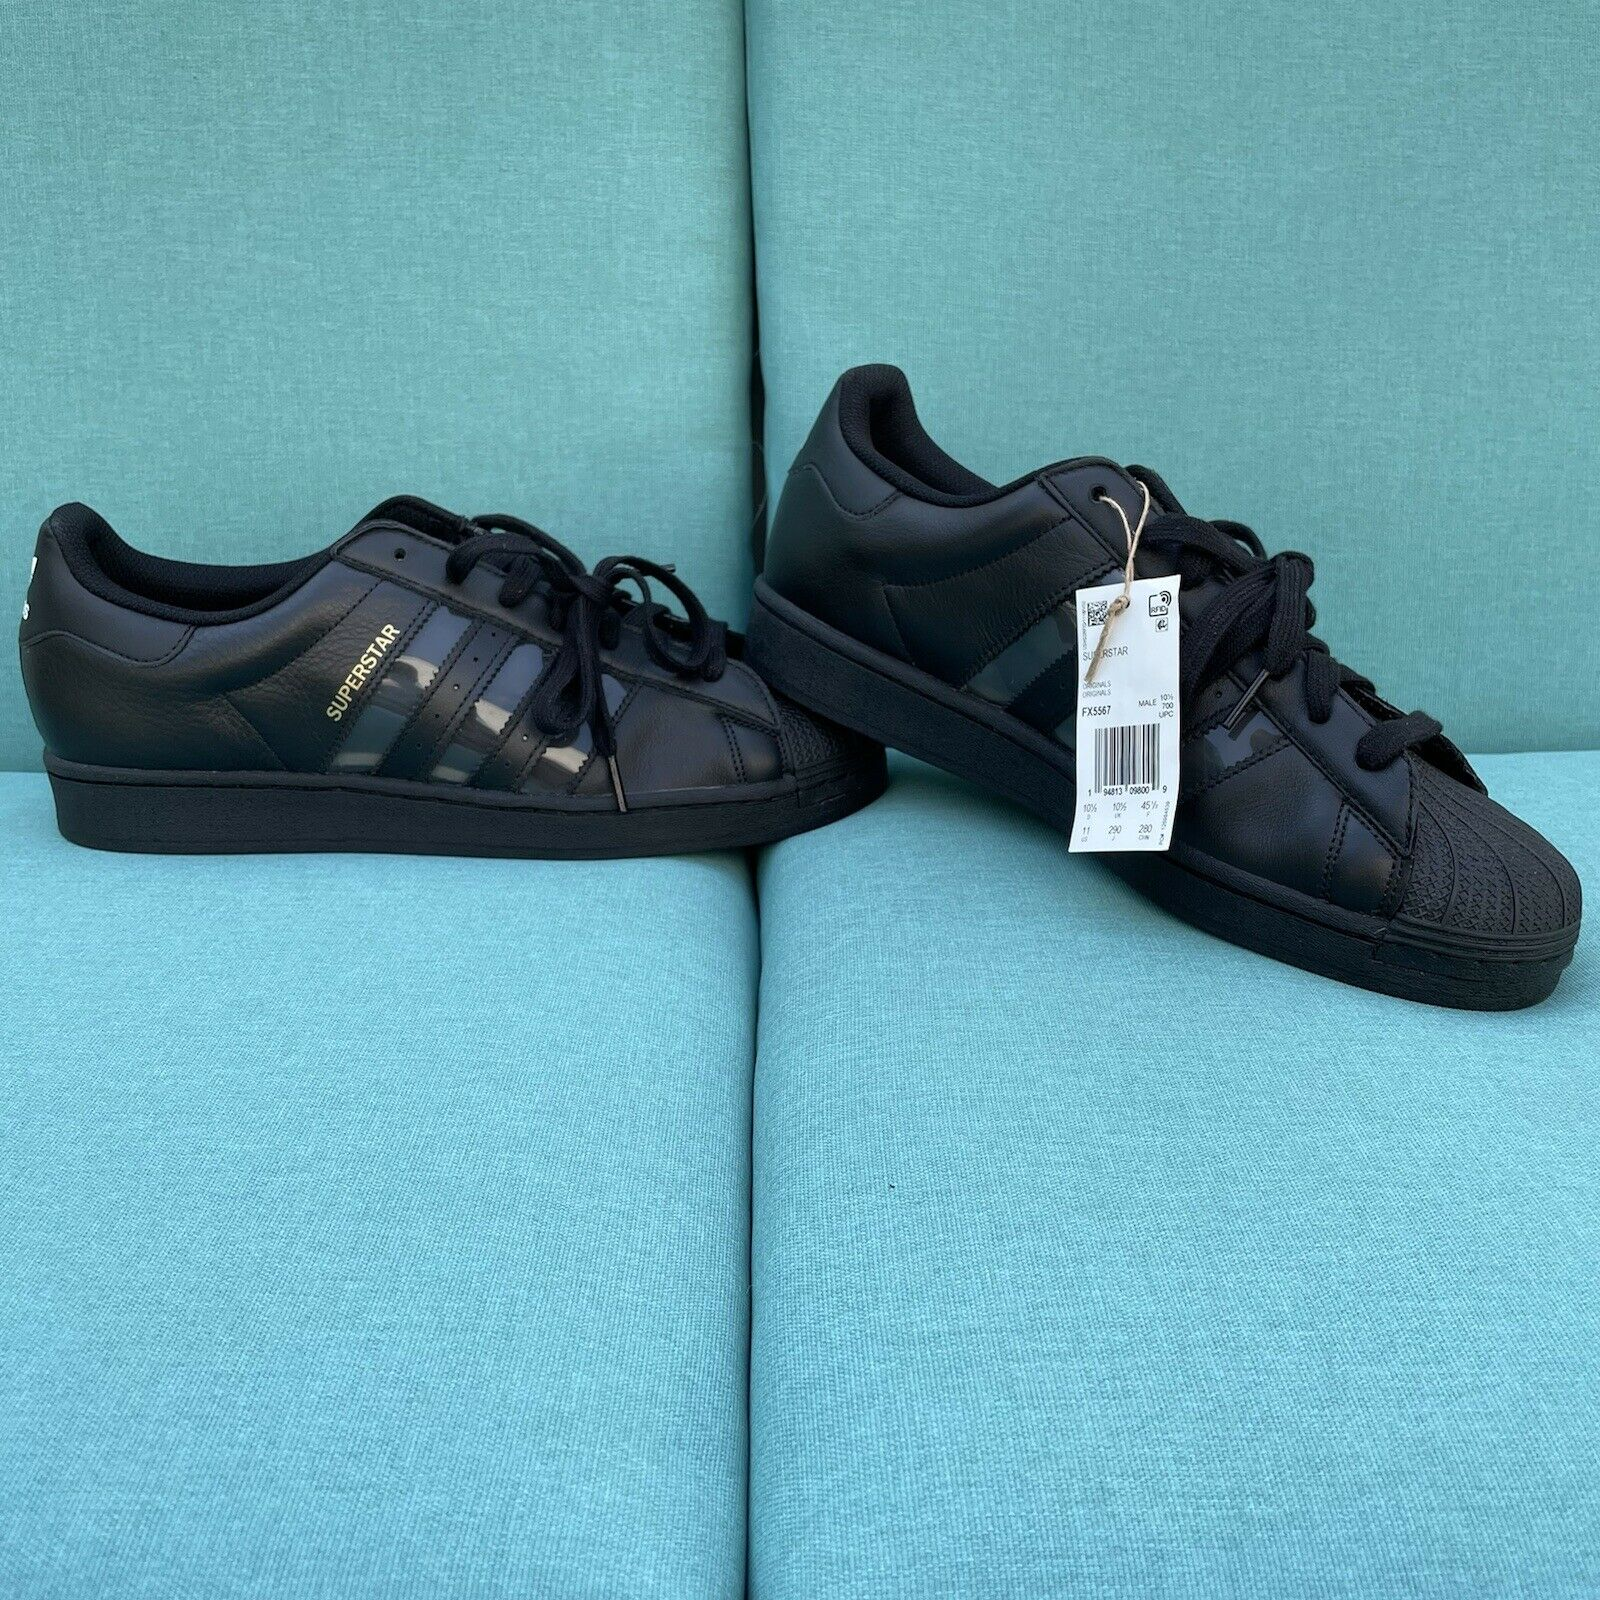 New Adidas Shoes Superstar 'Black Transparent' FX5567 Mens Size 11 Leather